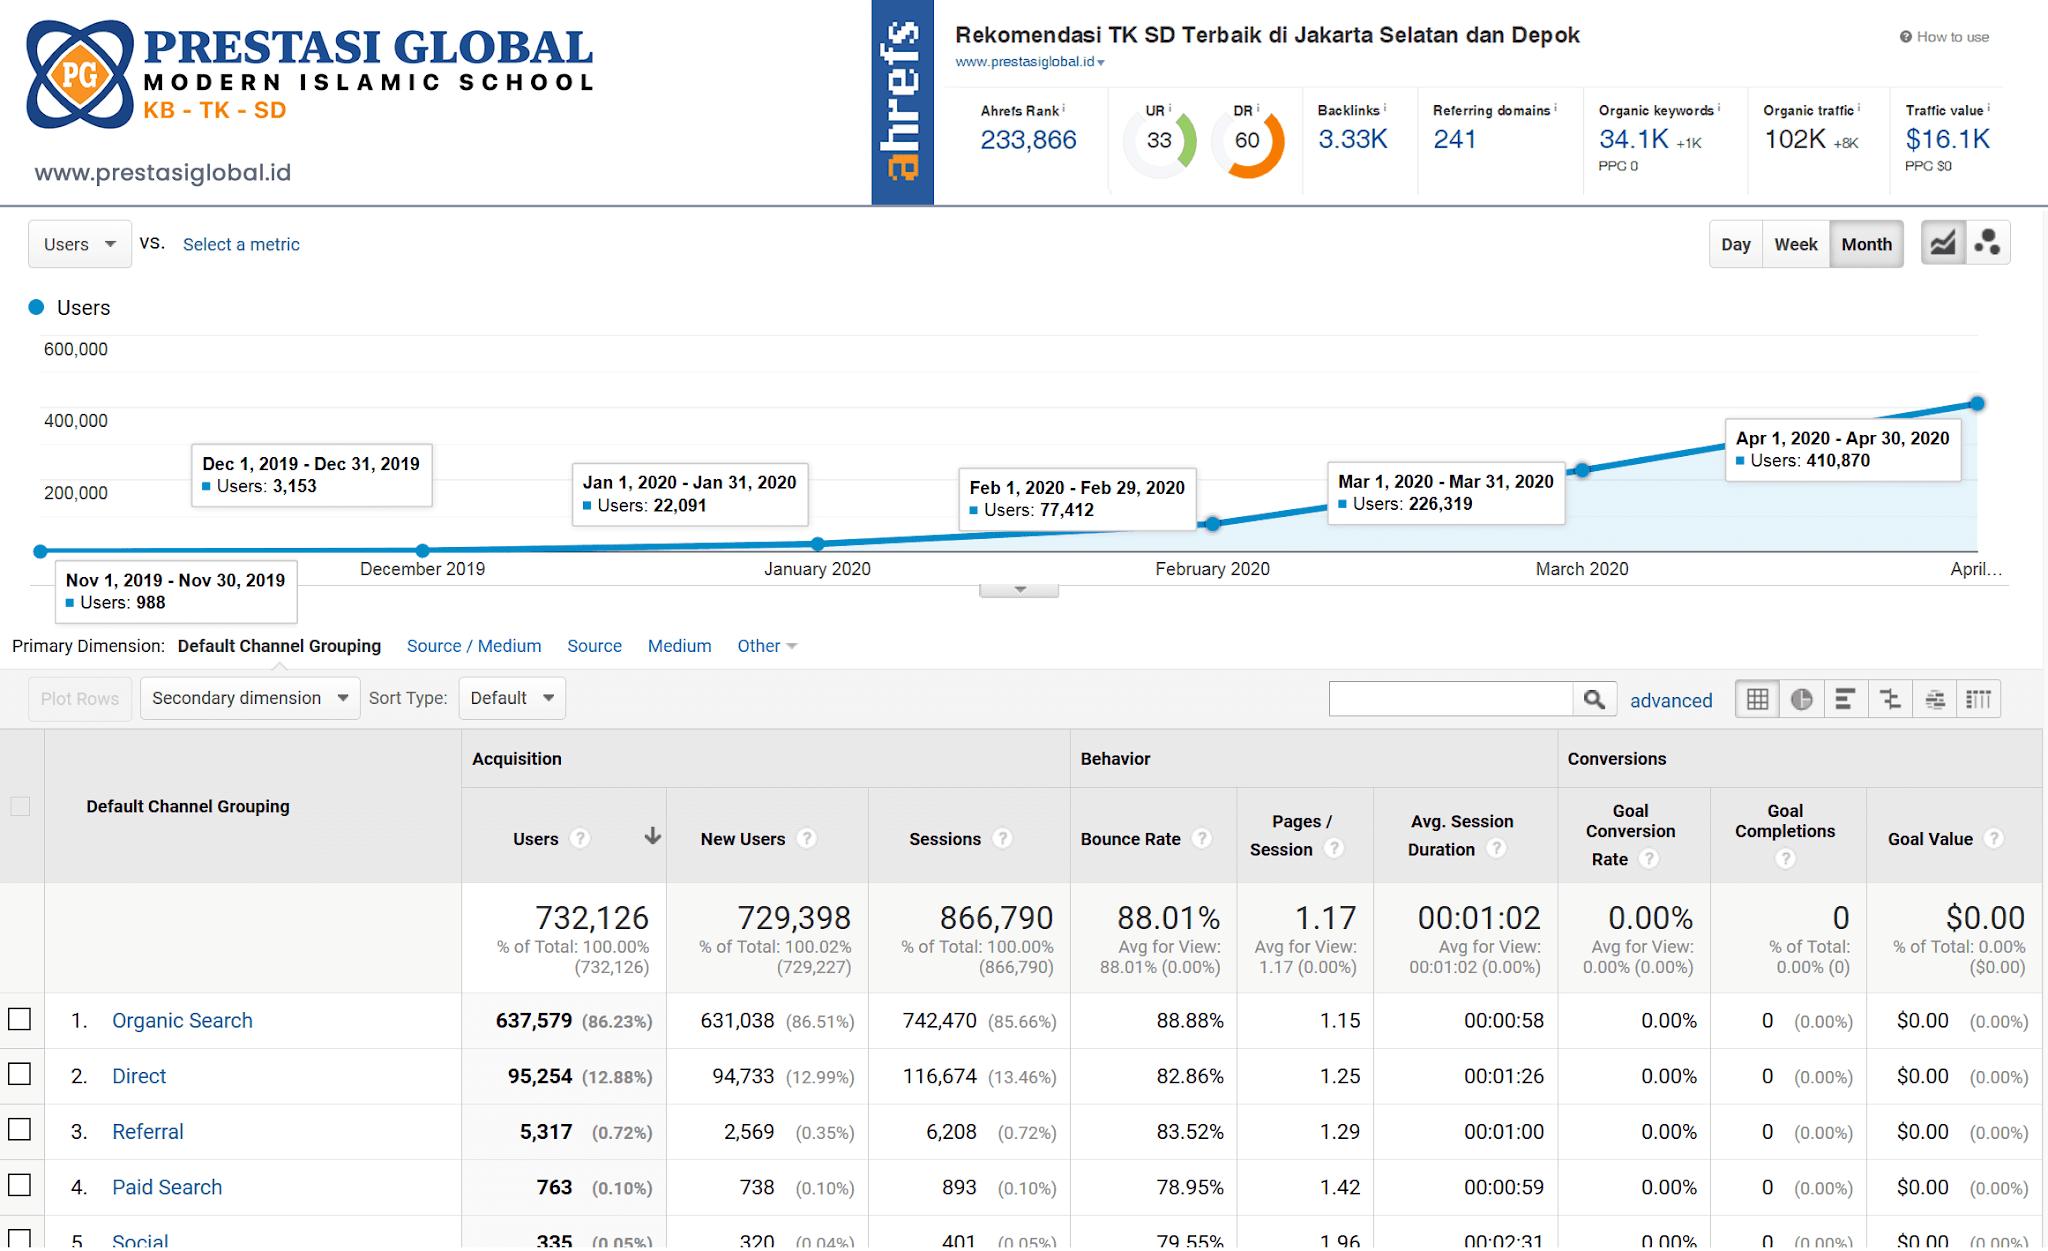 Hasil Generasi Baru SEO dari Arfadia, meningkatkan Traffic dan Sales